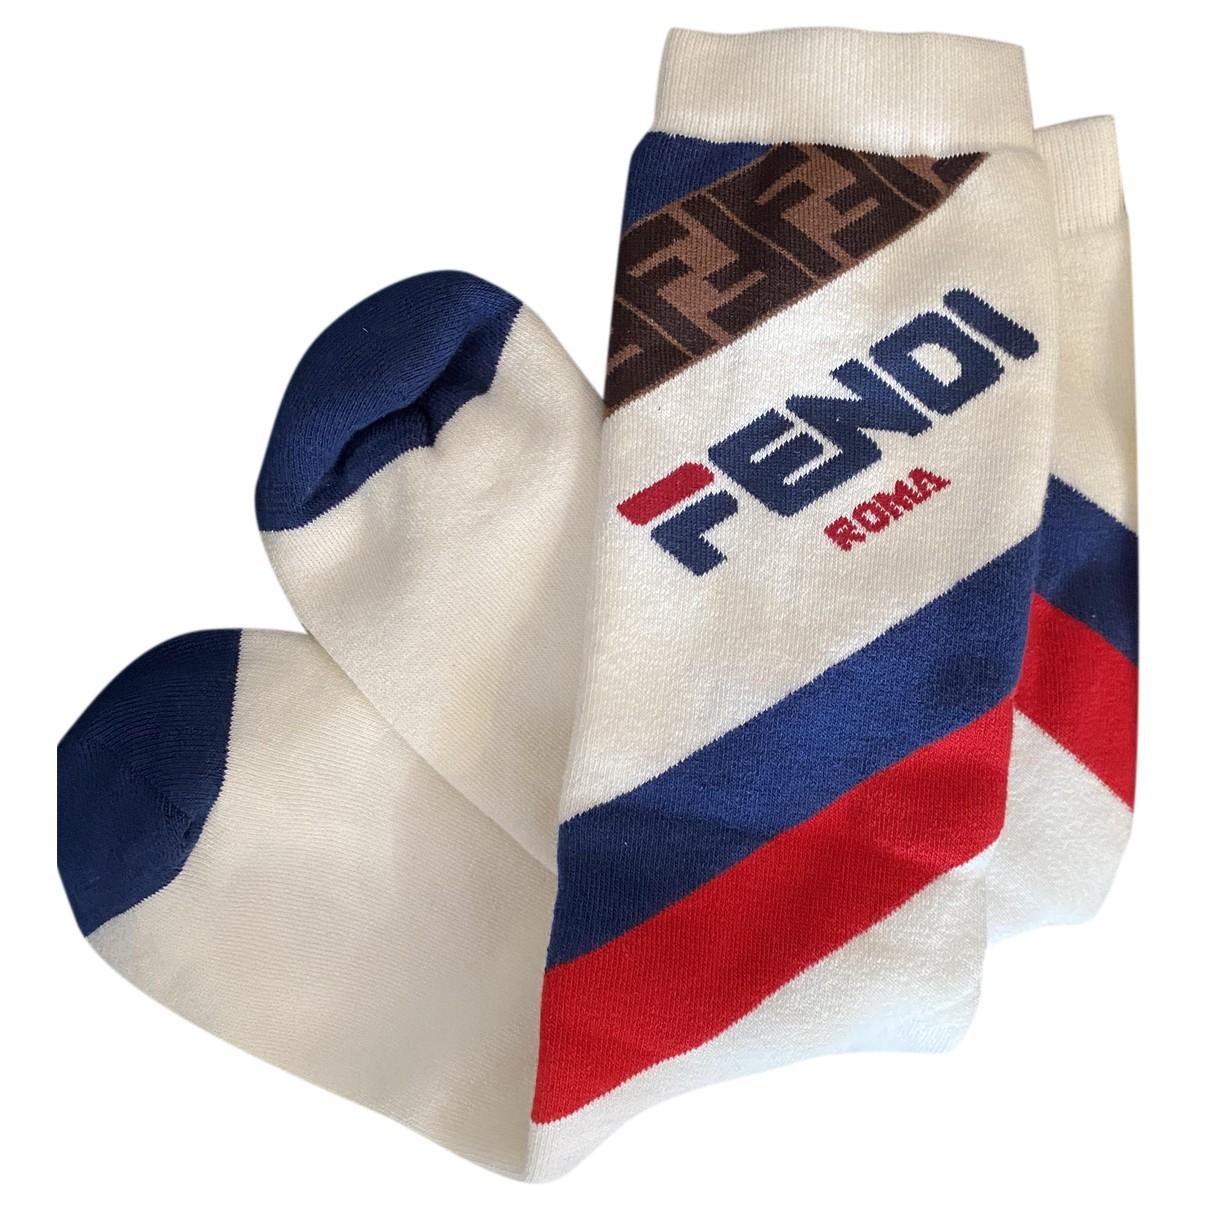 Fendi N Multicolour Cotton scarf & pocket squares for Men N